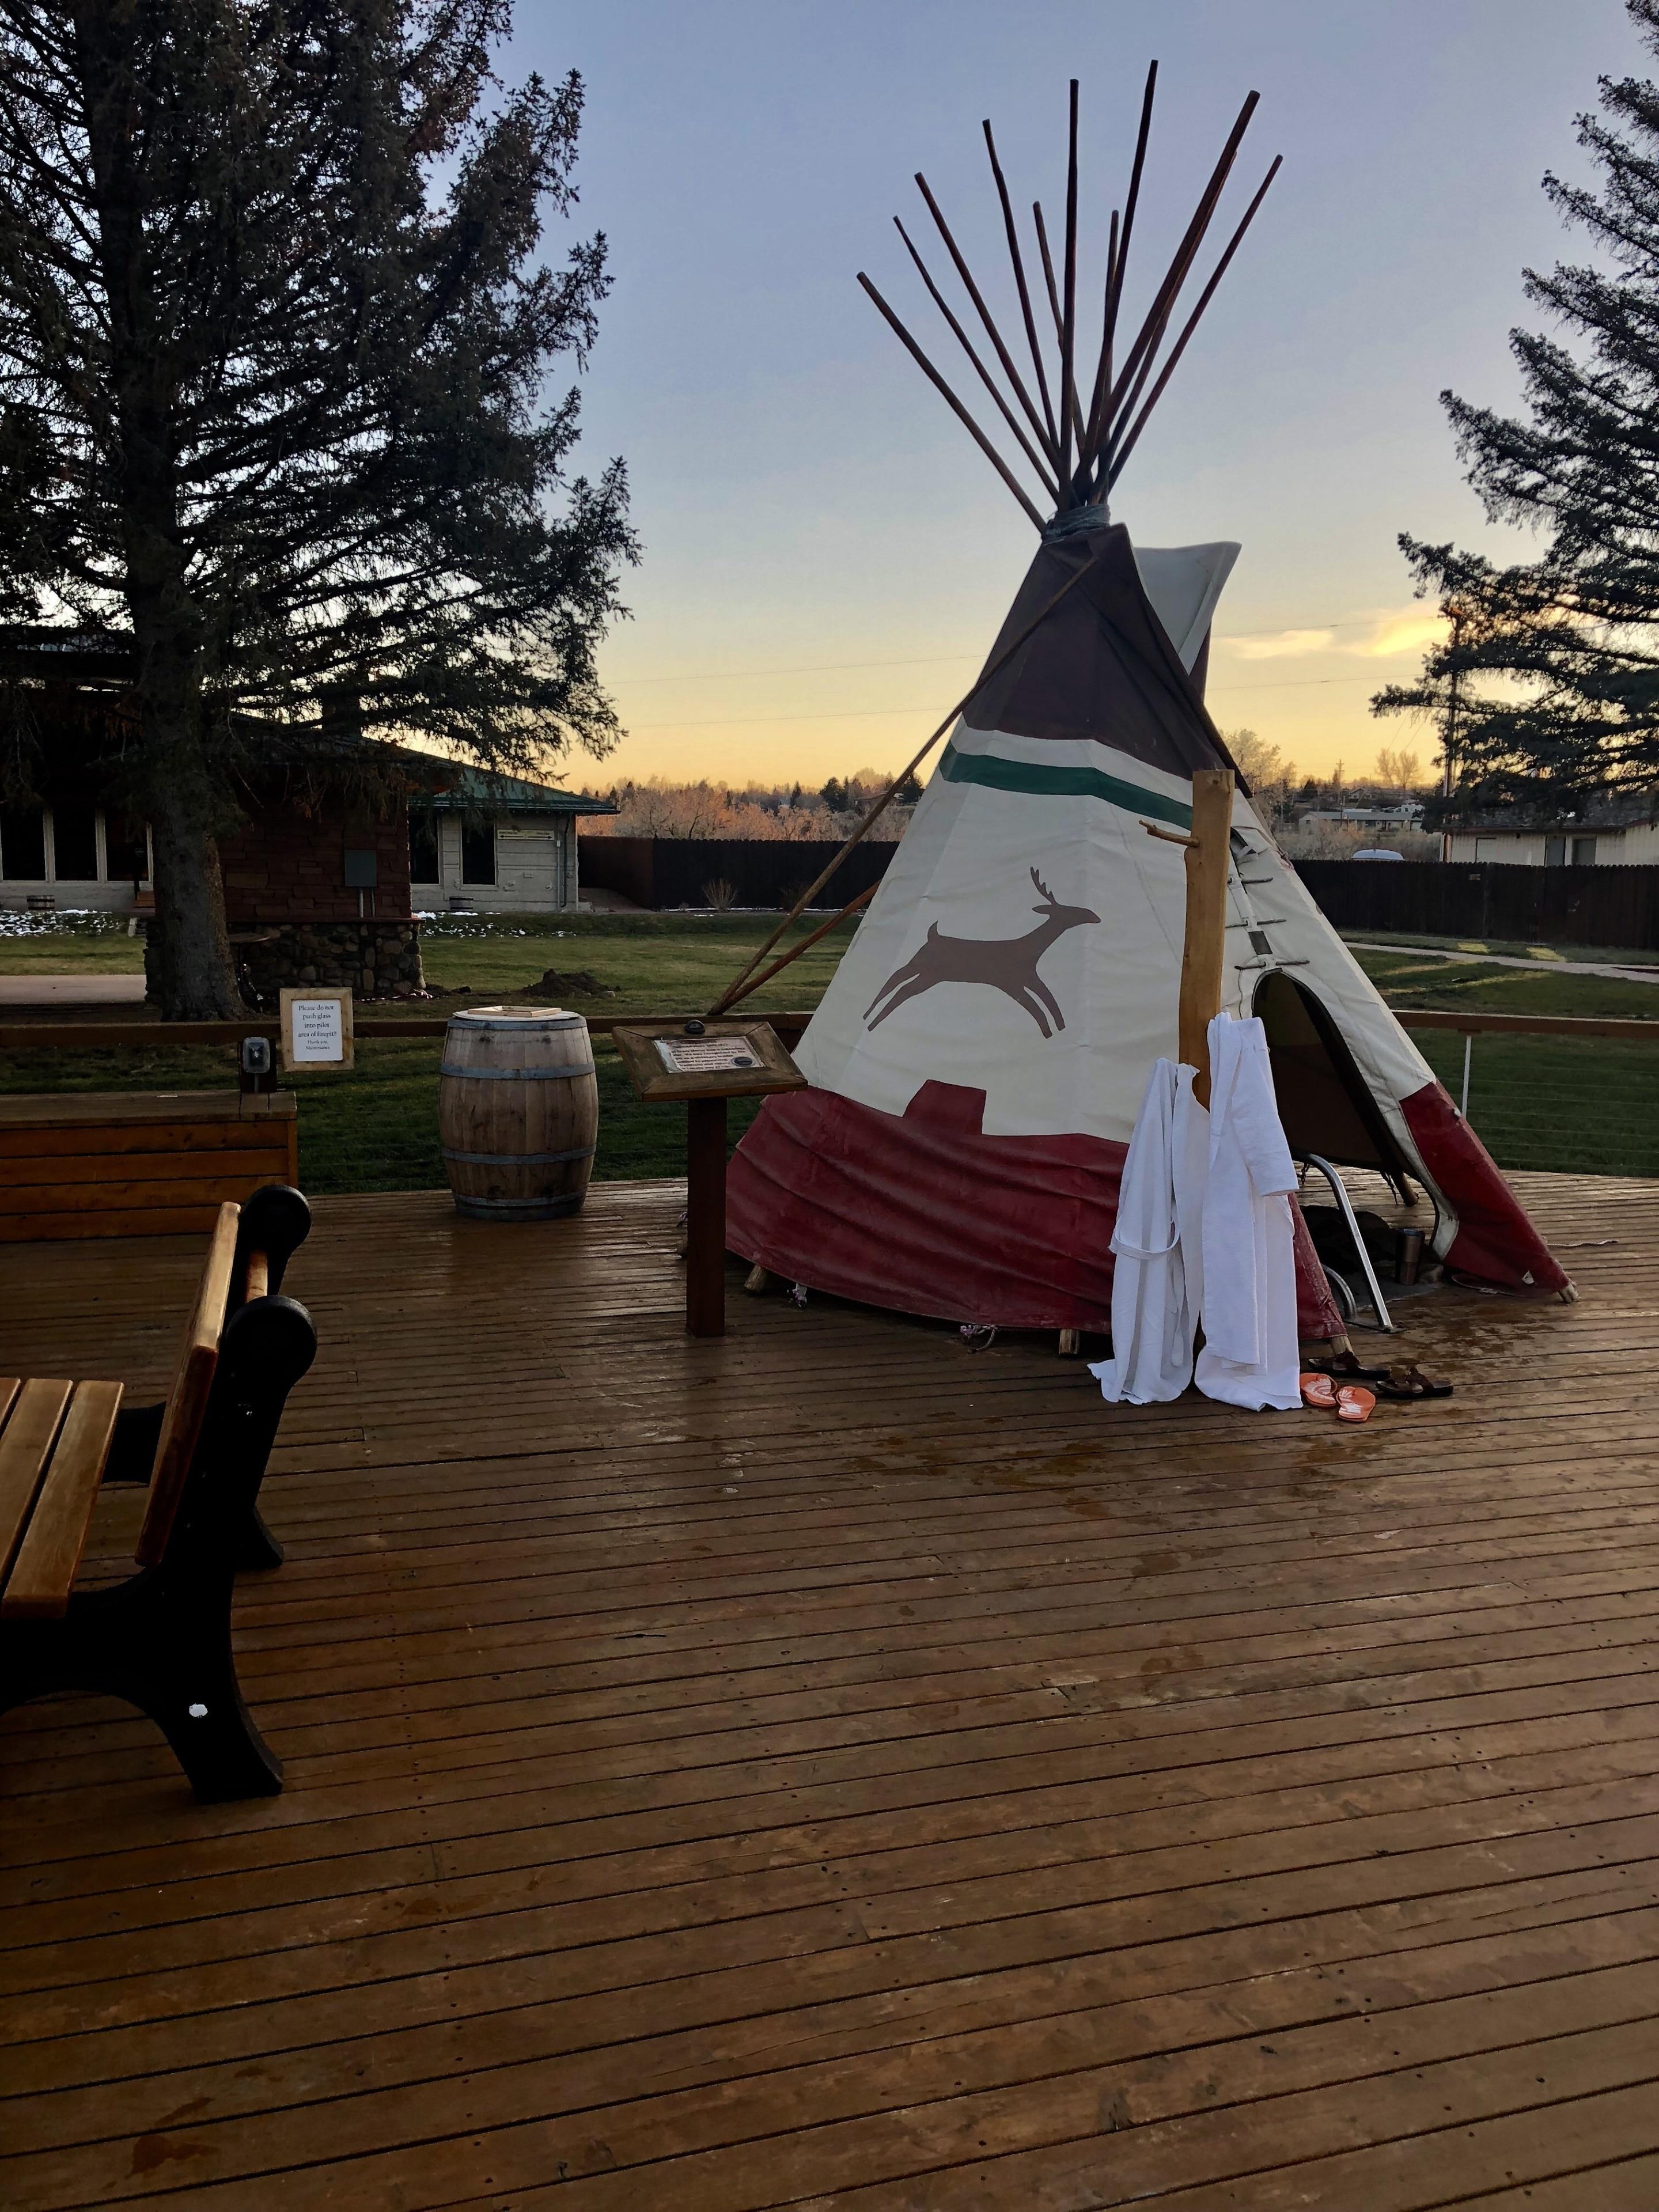 Saratoga, Wyoming, USA